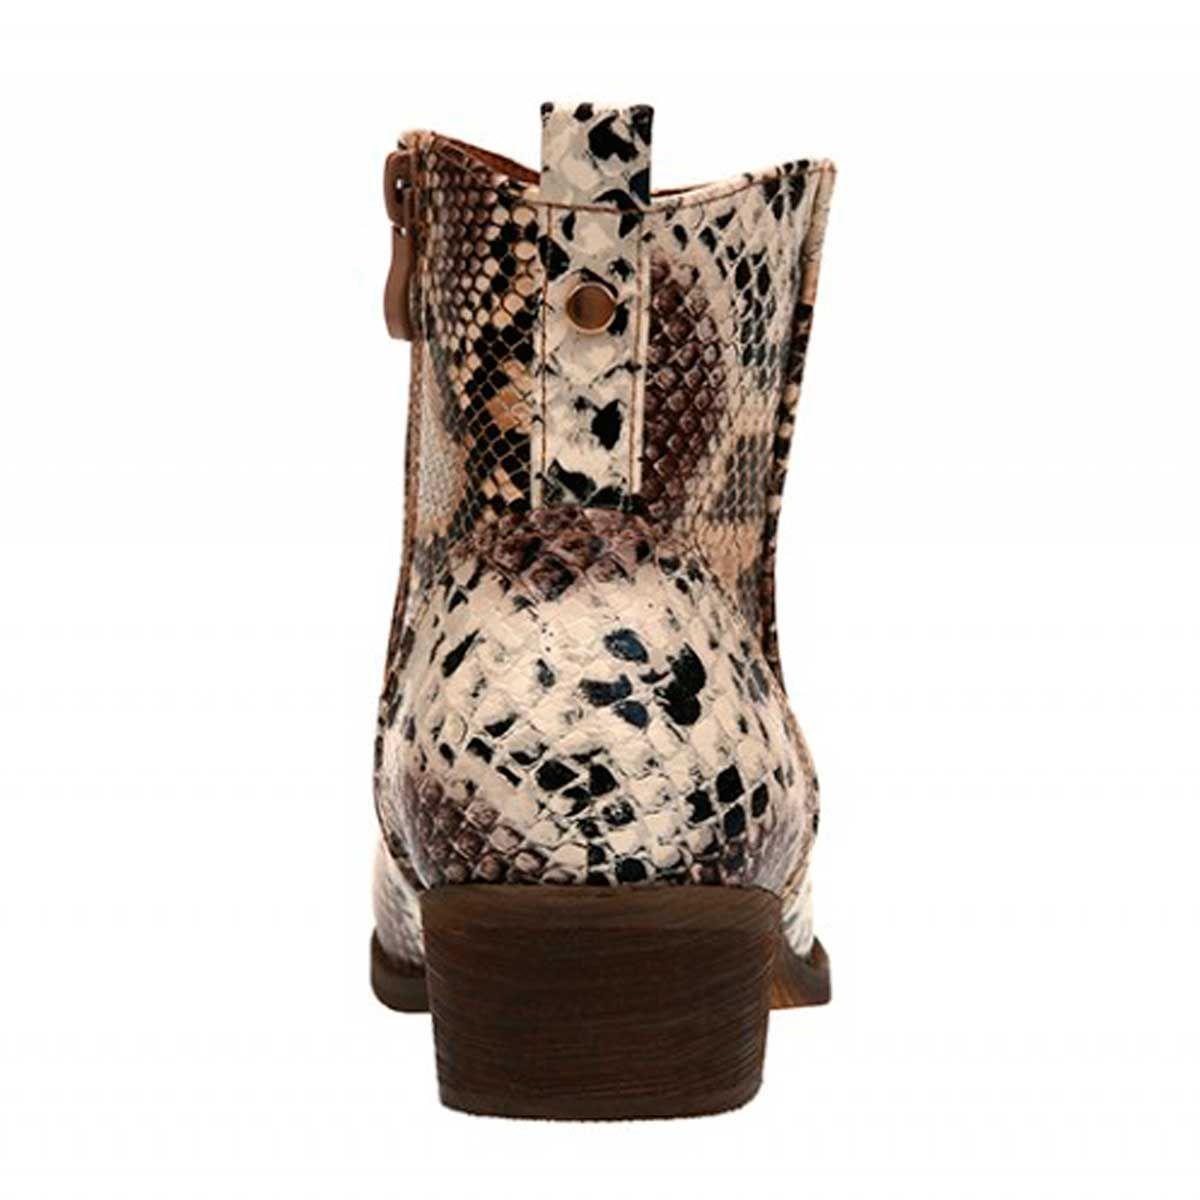 Montevita Flat Western Ankle Boot in Animal